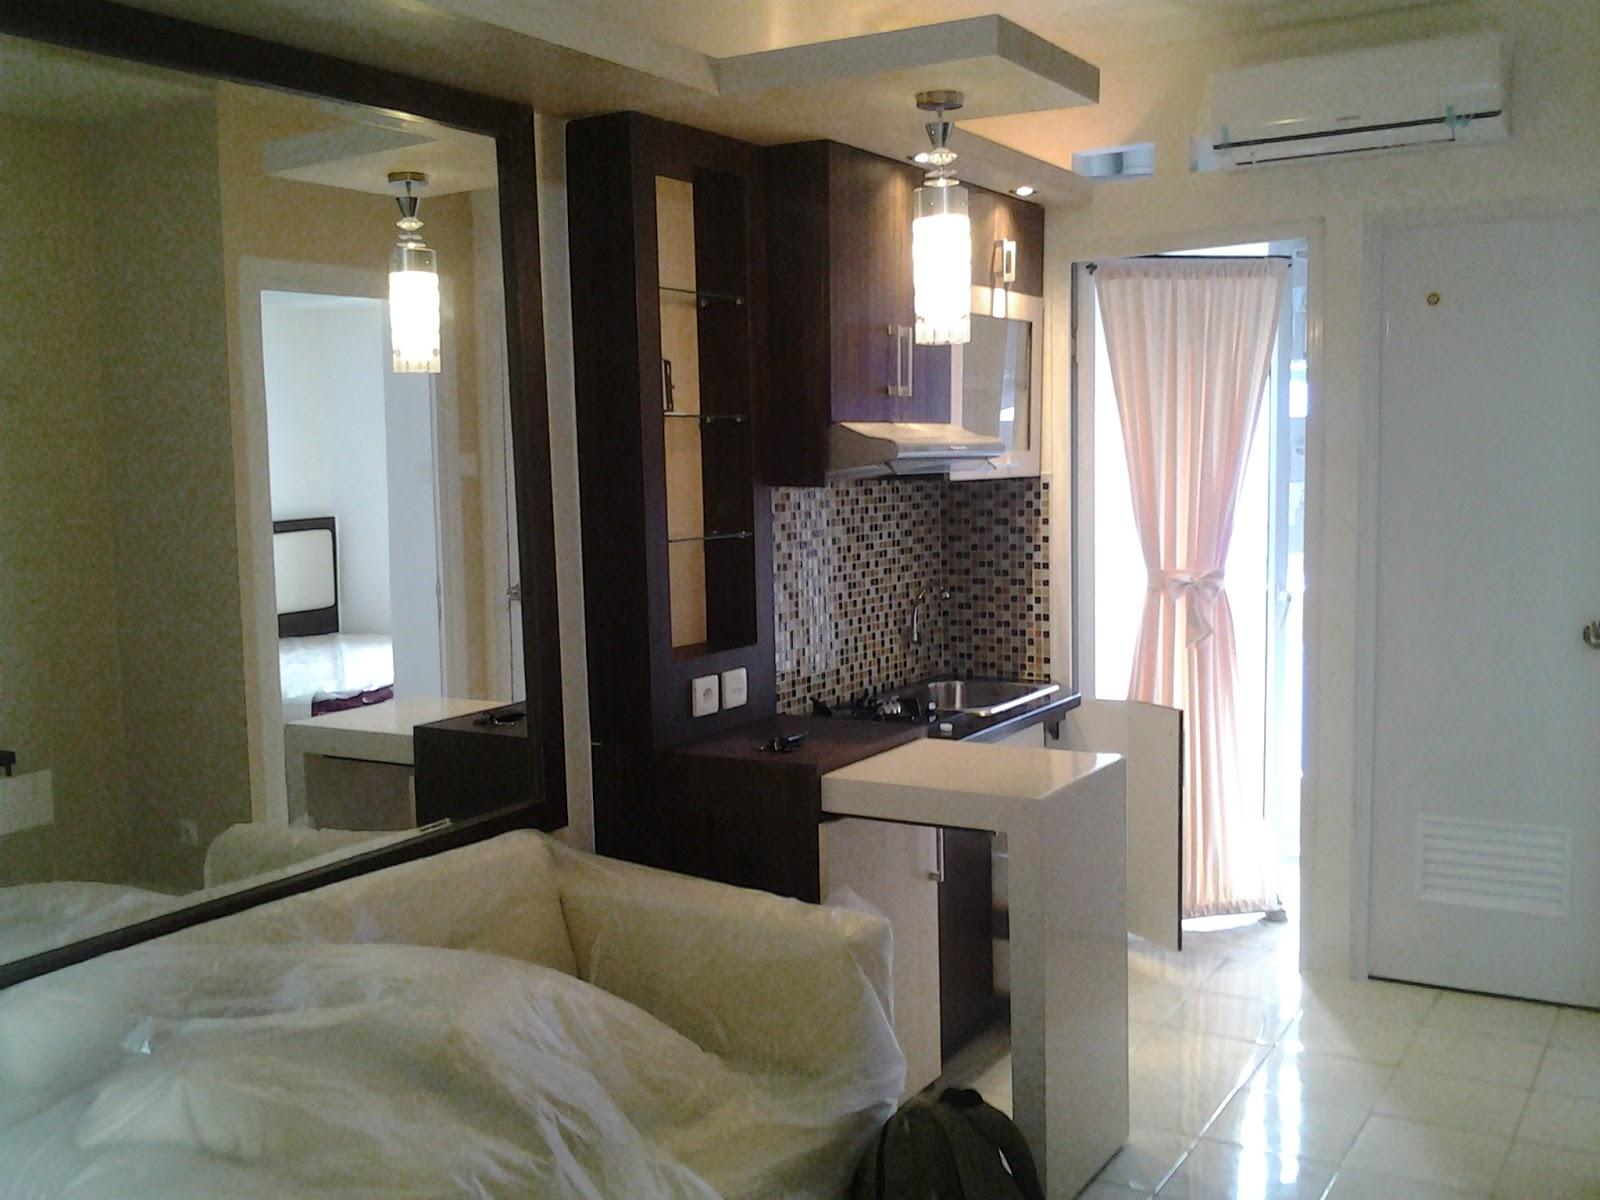 Harga paket interior apartemen 2 bedroom infinity for Interior apartemen studio